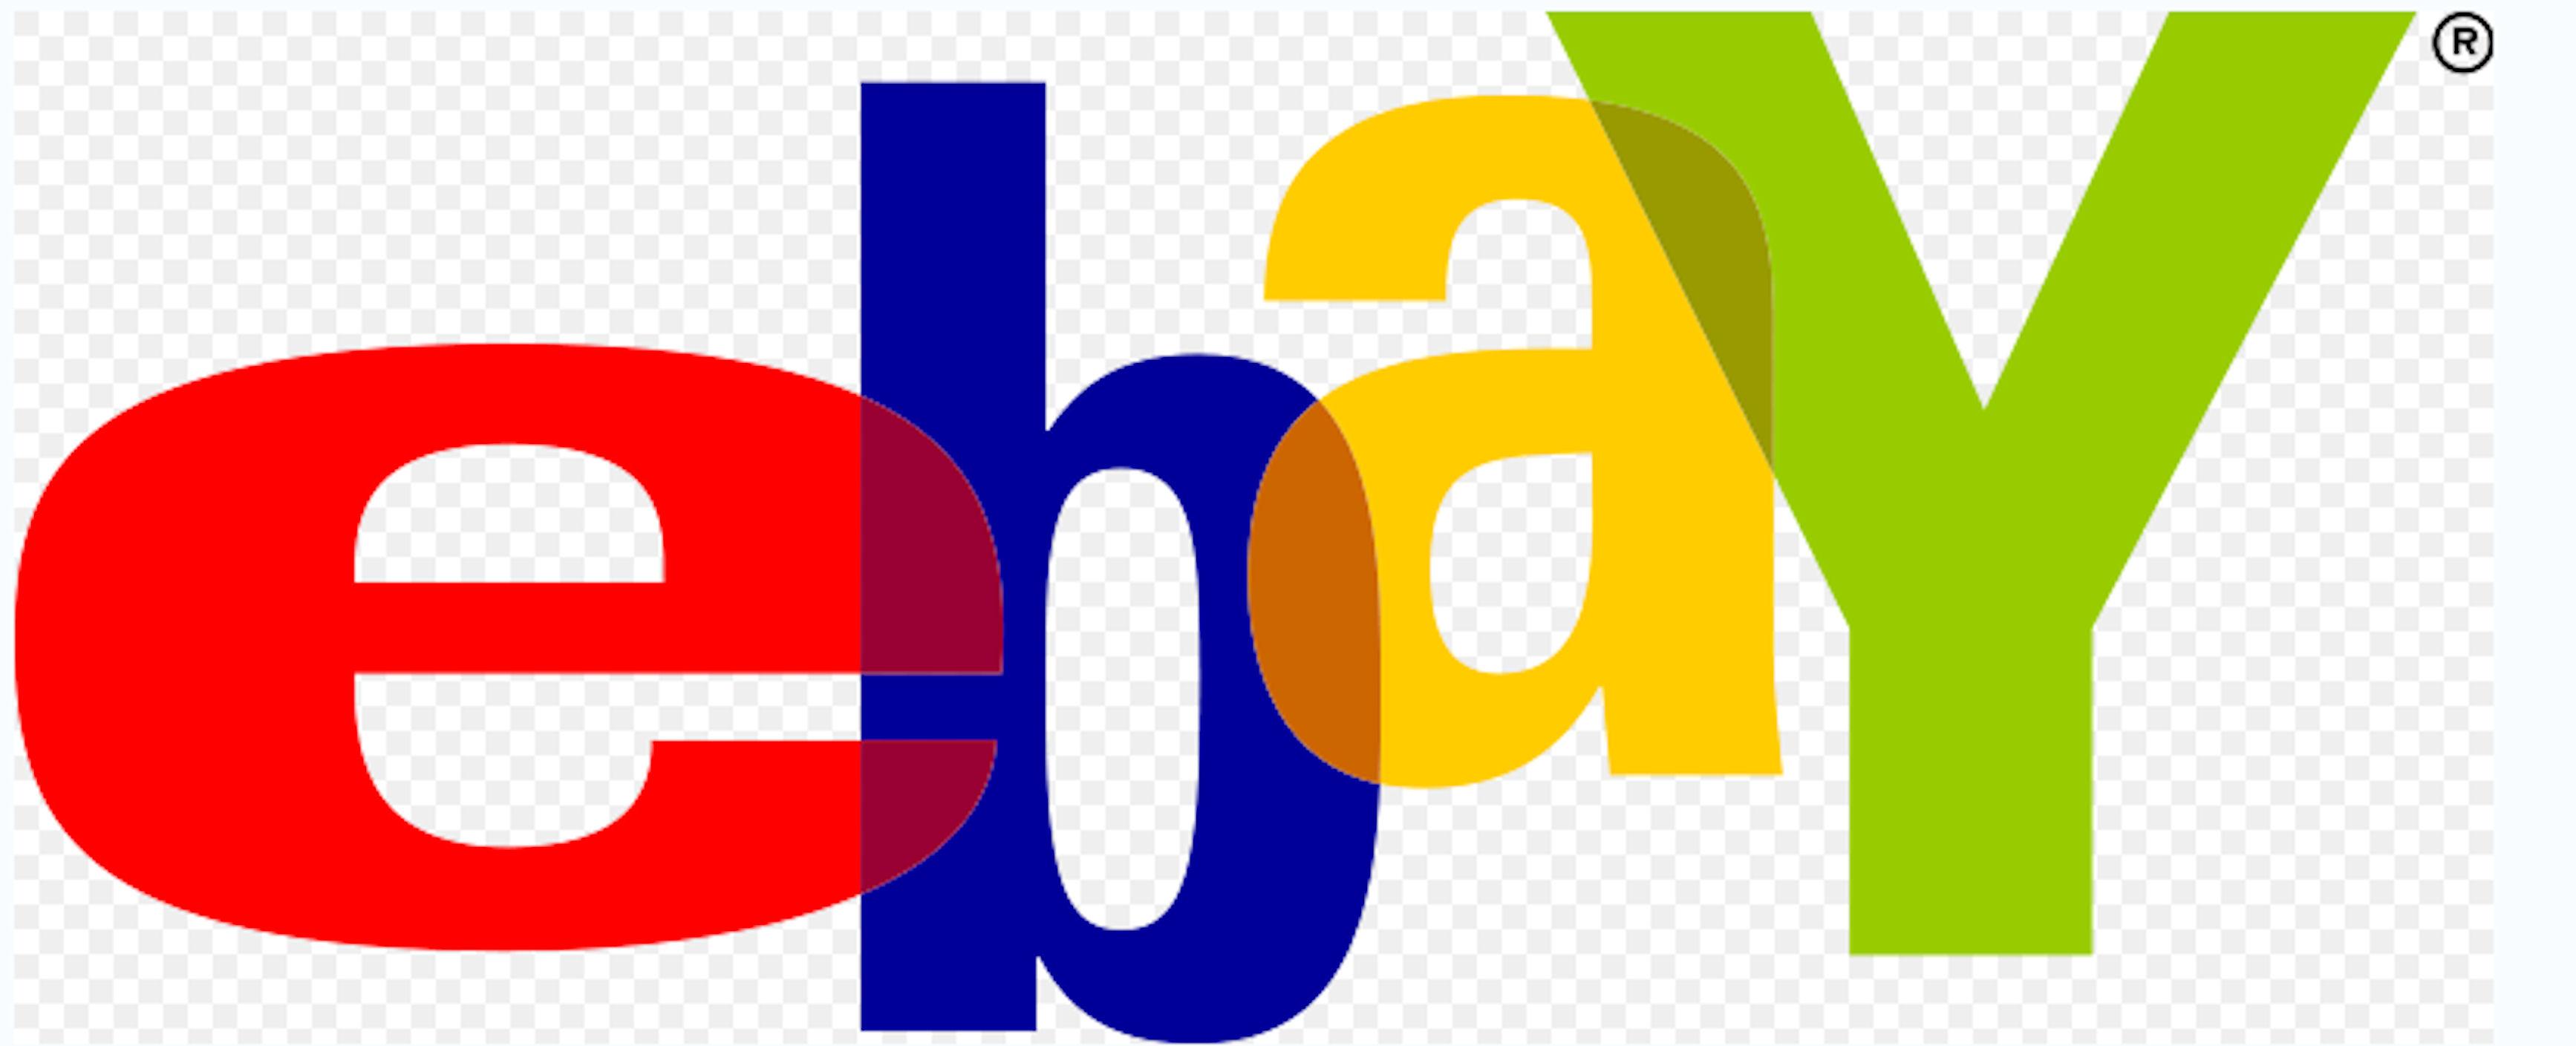 25% rise in eBay millionaires